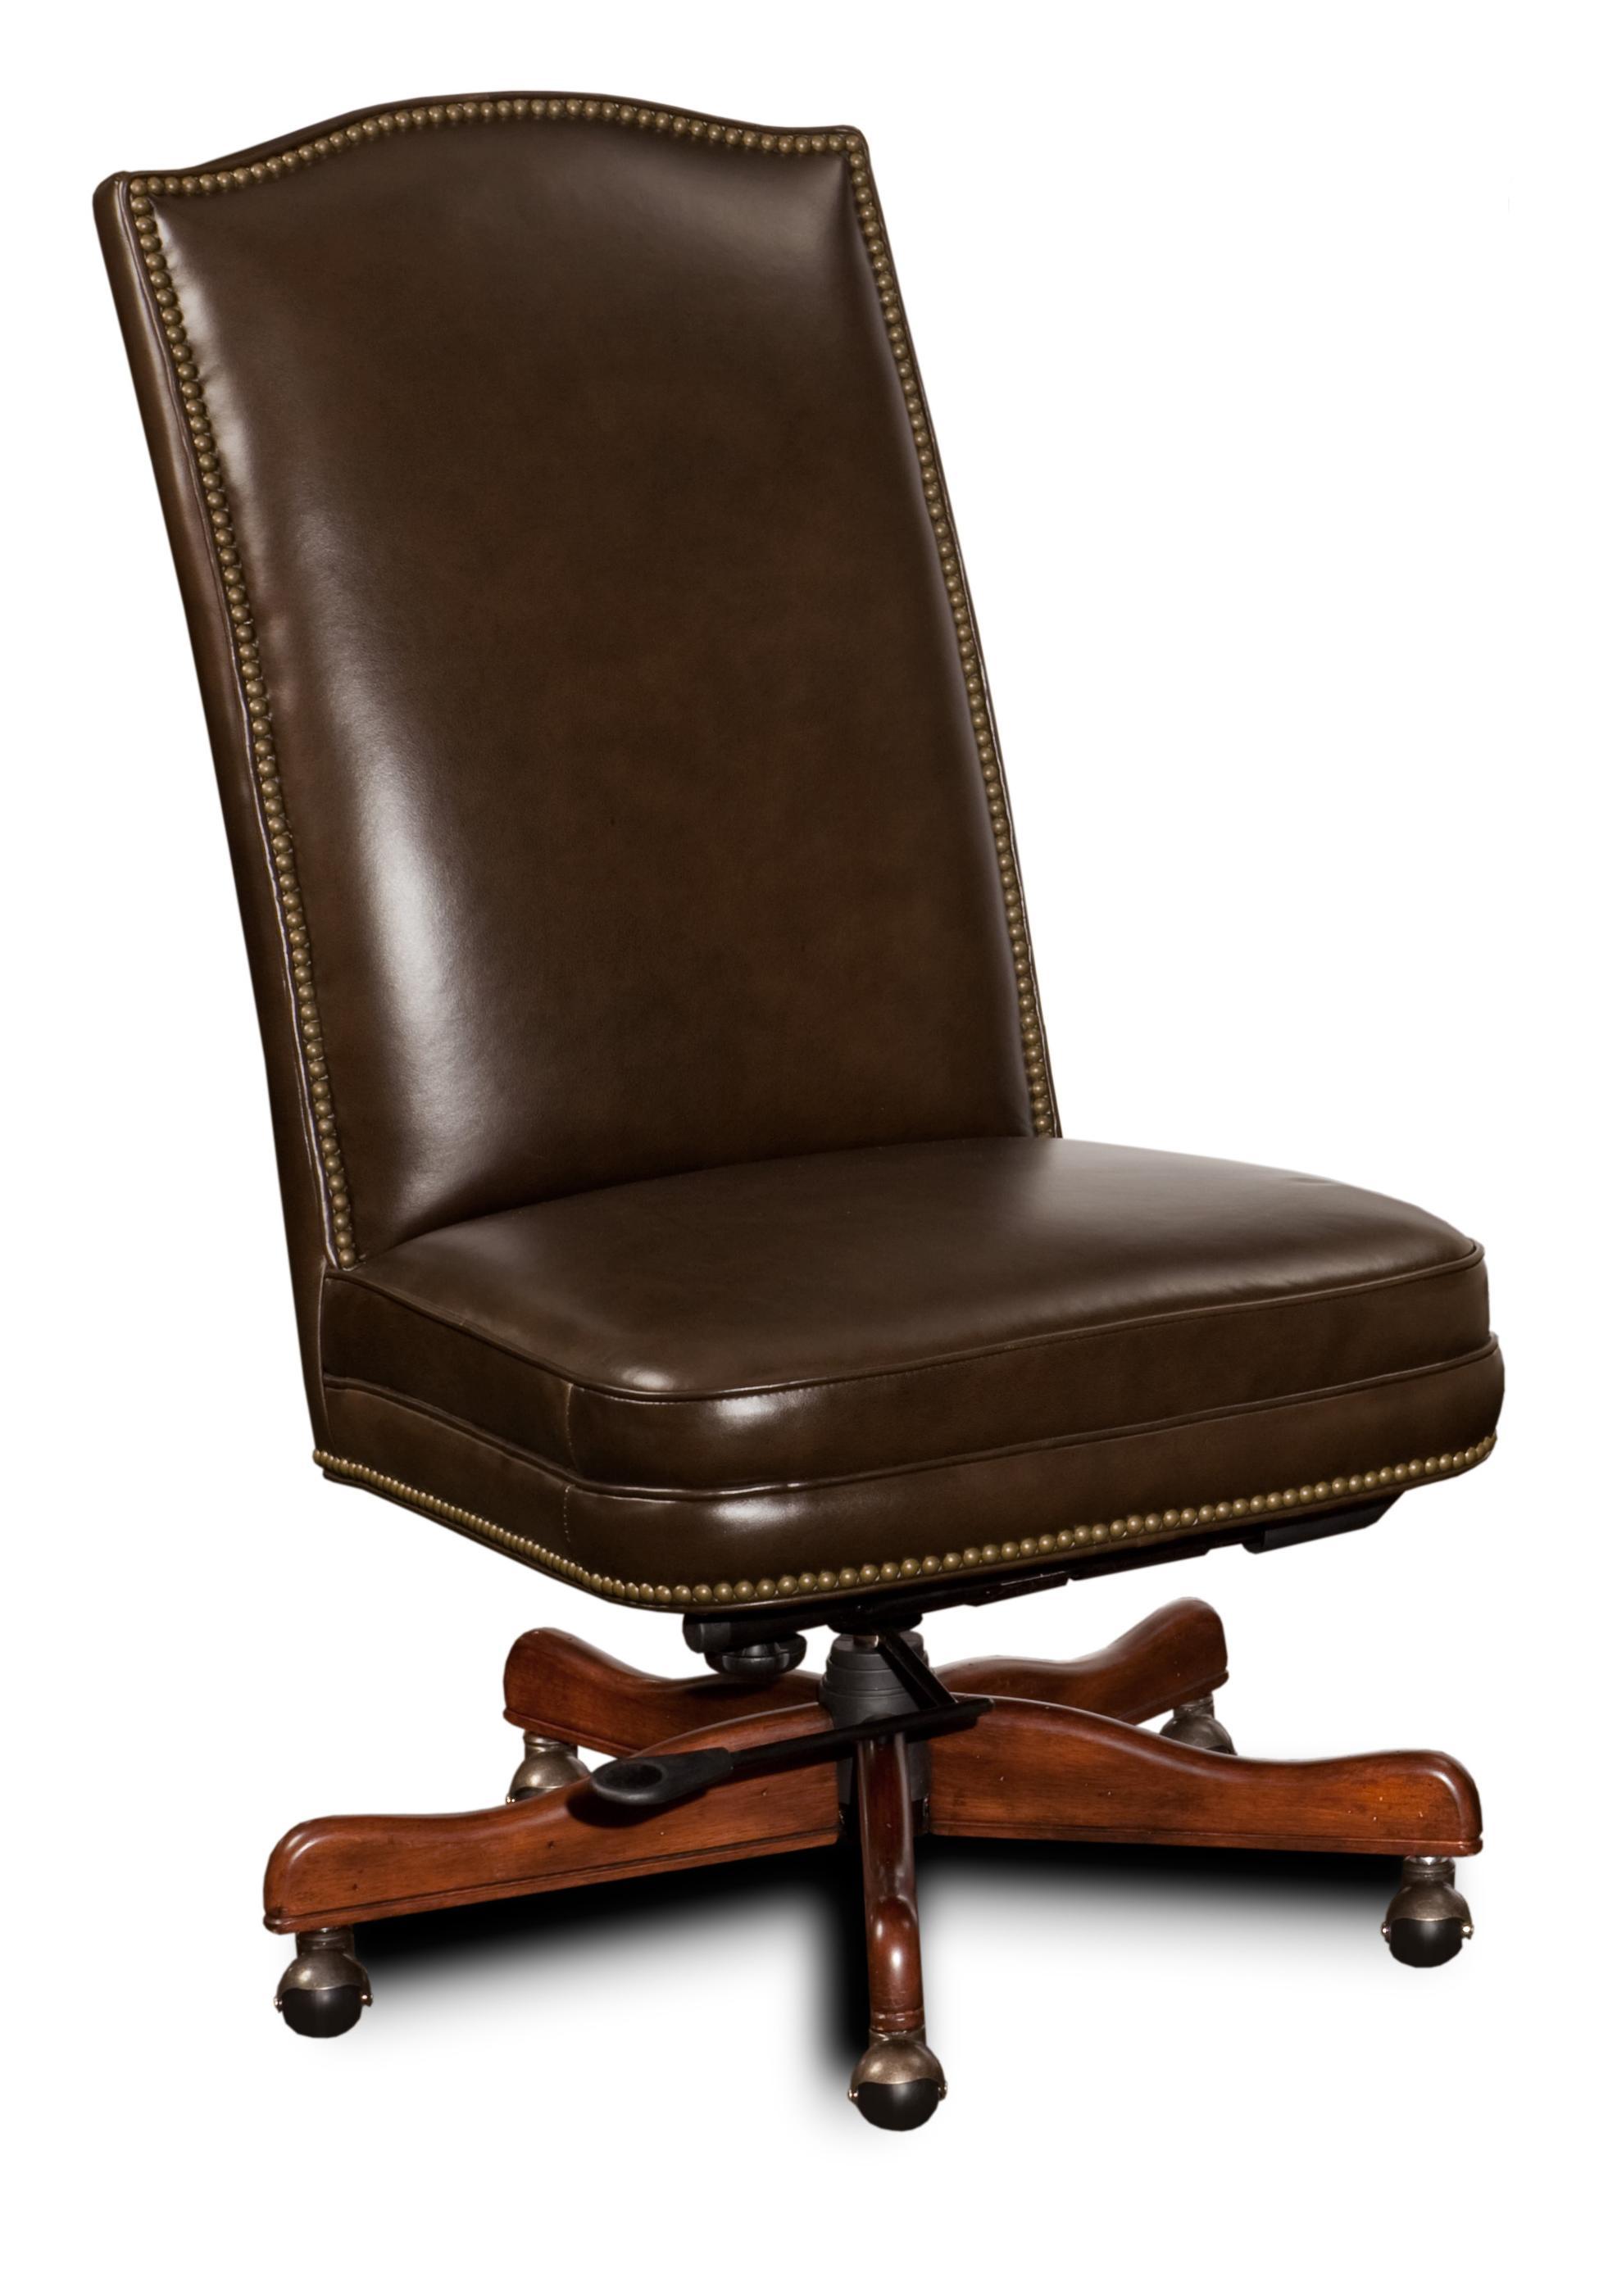 Hooker Furniture Executive Seating Executive Chair - Item Number: EC373-089